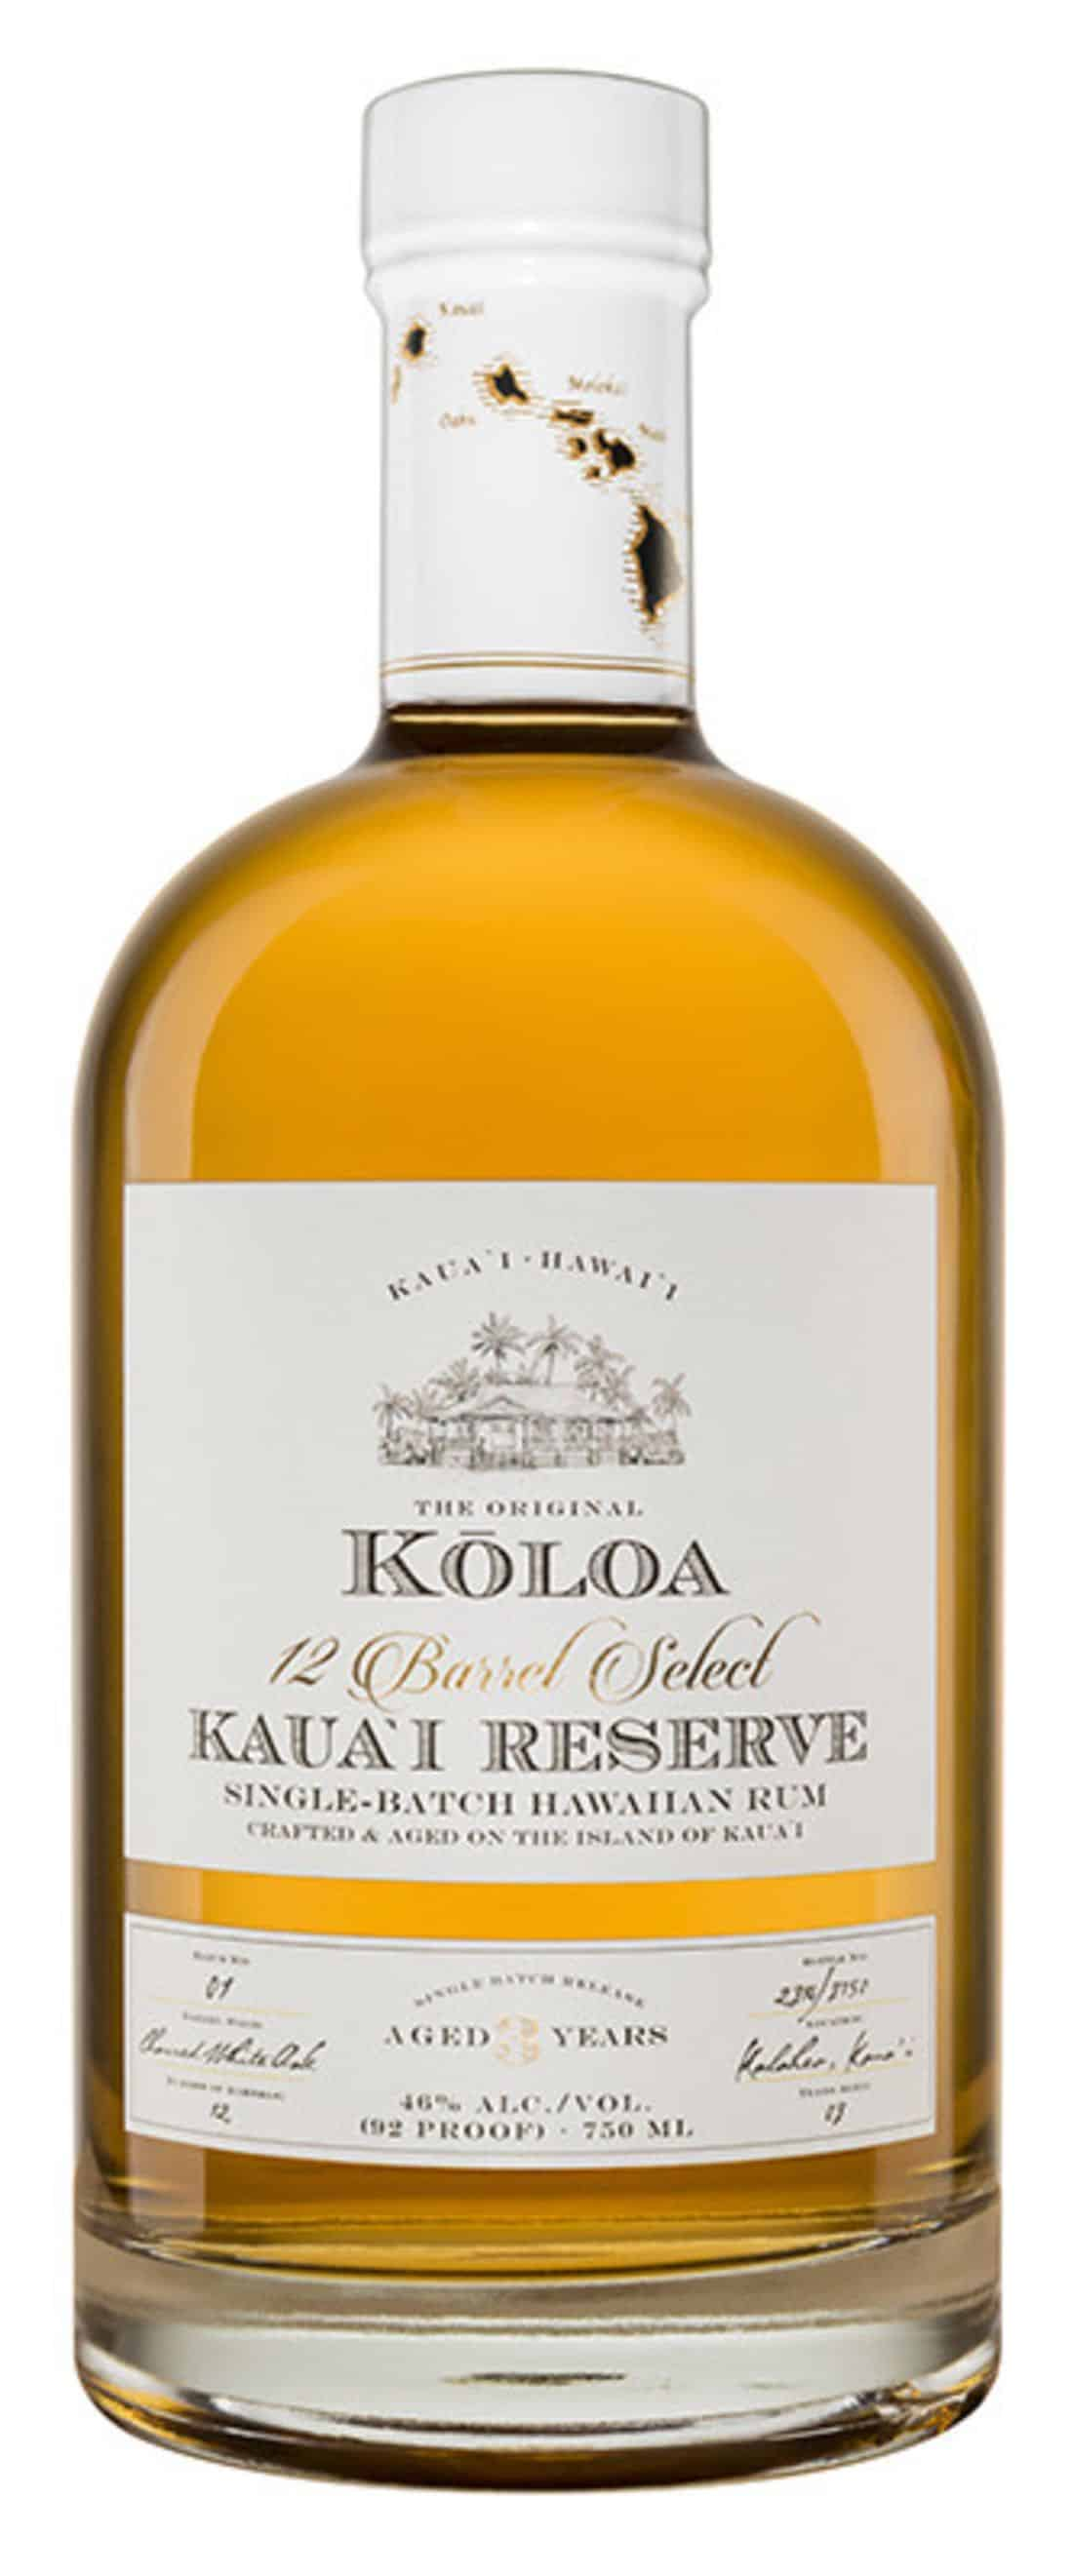 Kauai-Reserve-Three-Year-Aged-Hawaiian-Rum-333x800-px